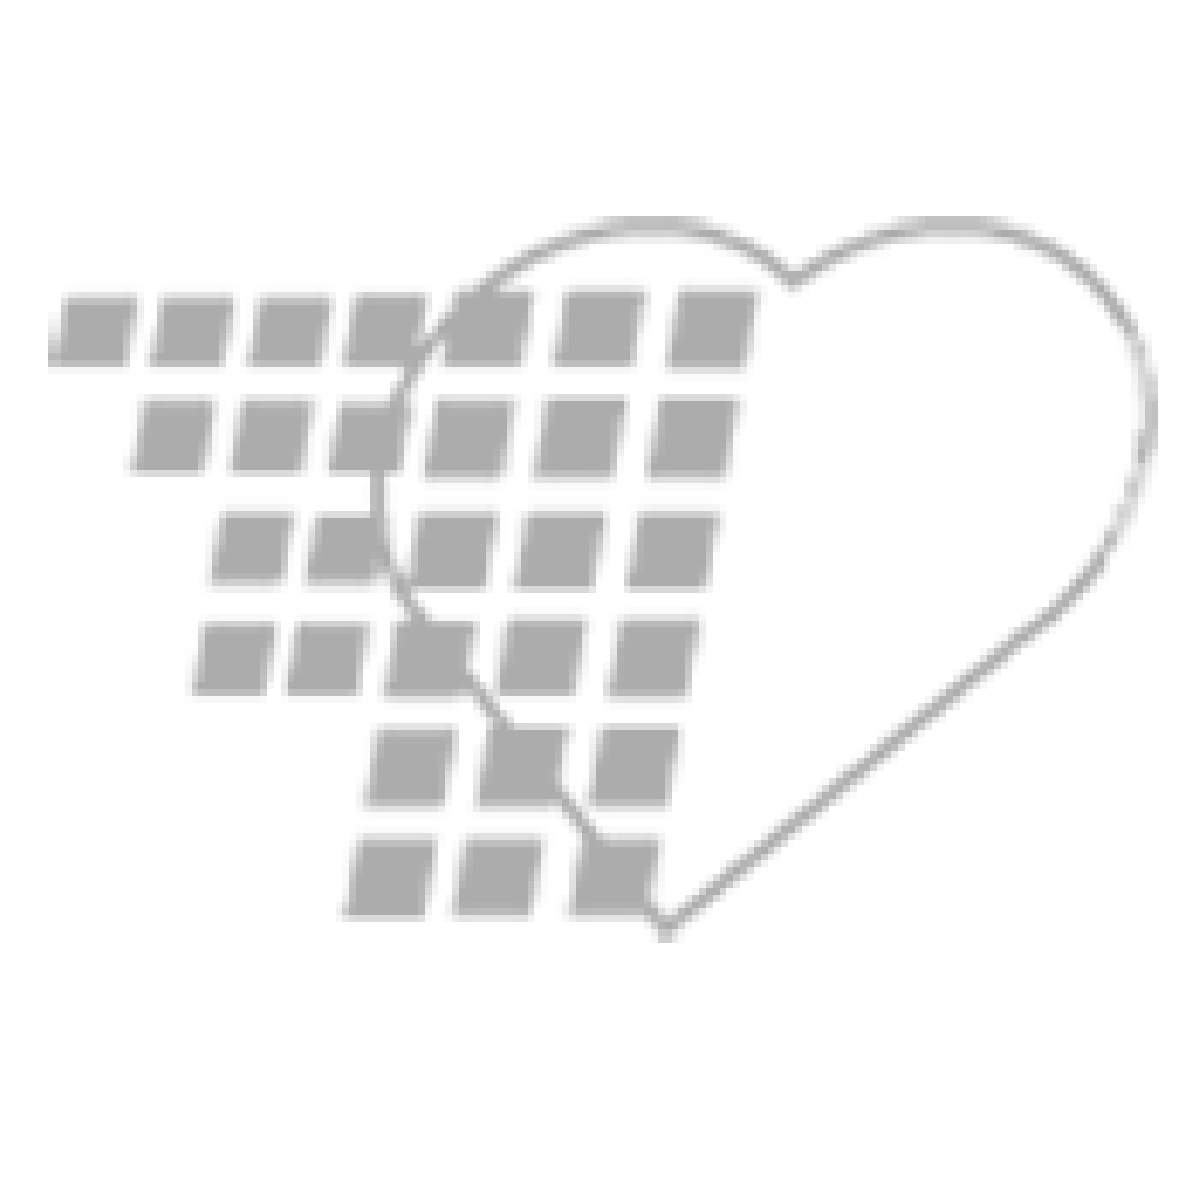 09-31-4152 - Child Development Handout Tablet